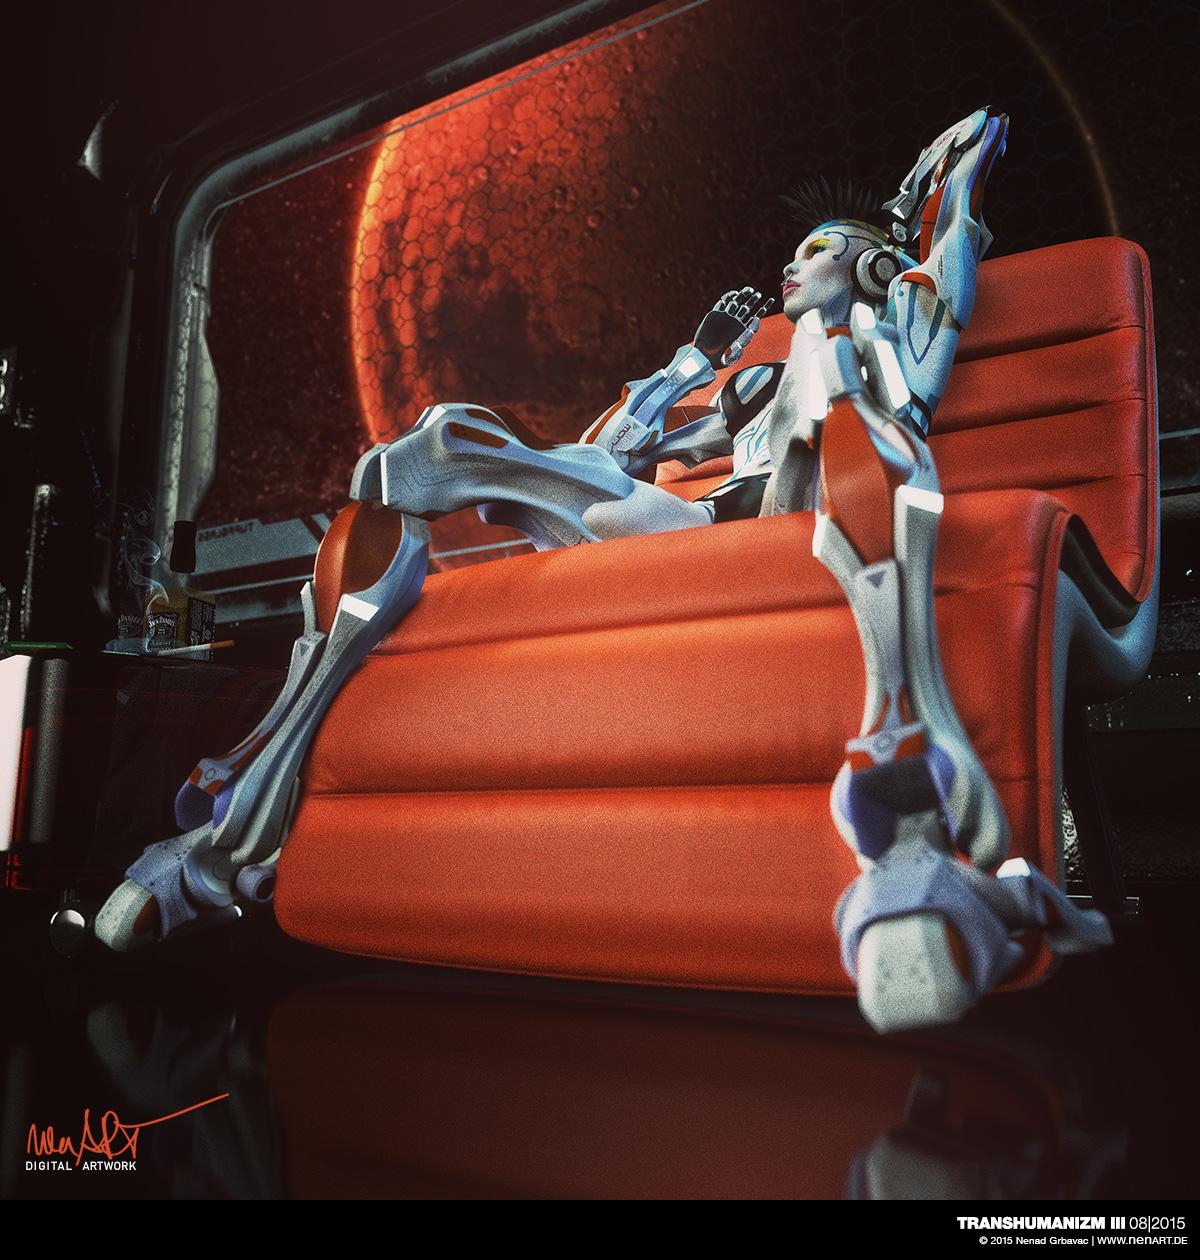 DA_-_Transhumanizm-III_1200x1200